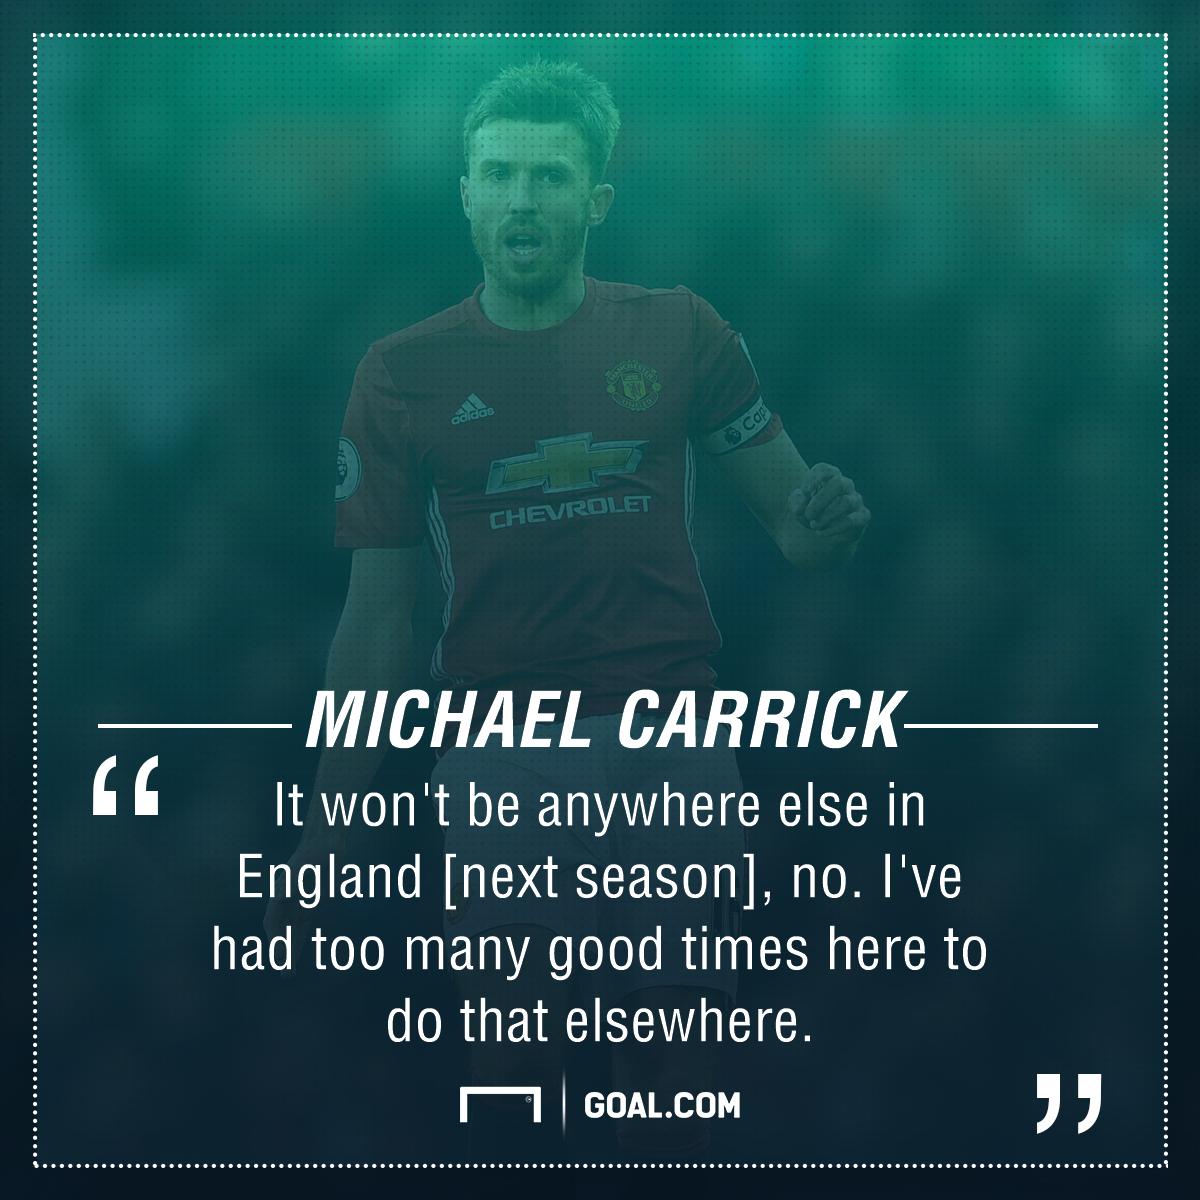 Michael Carrick Manchester United future